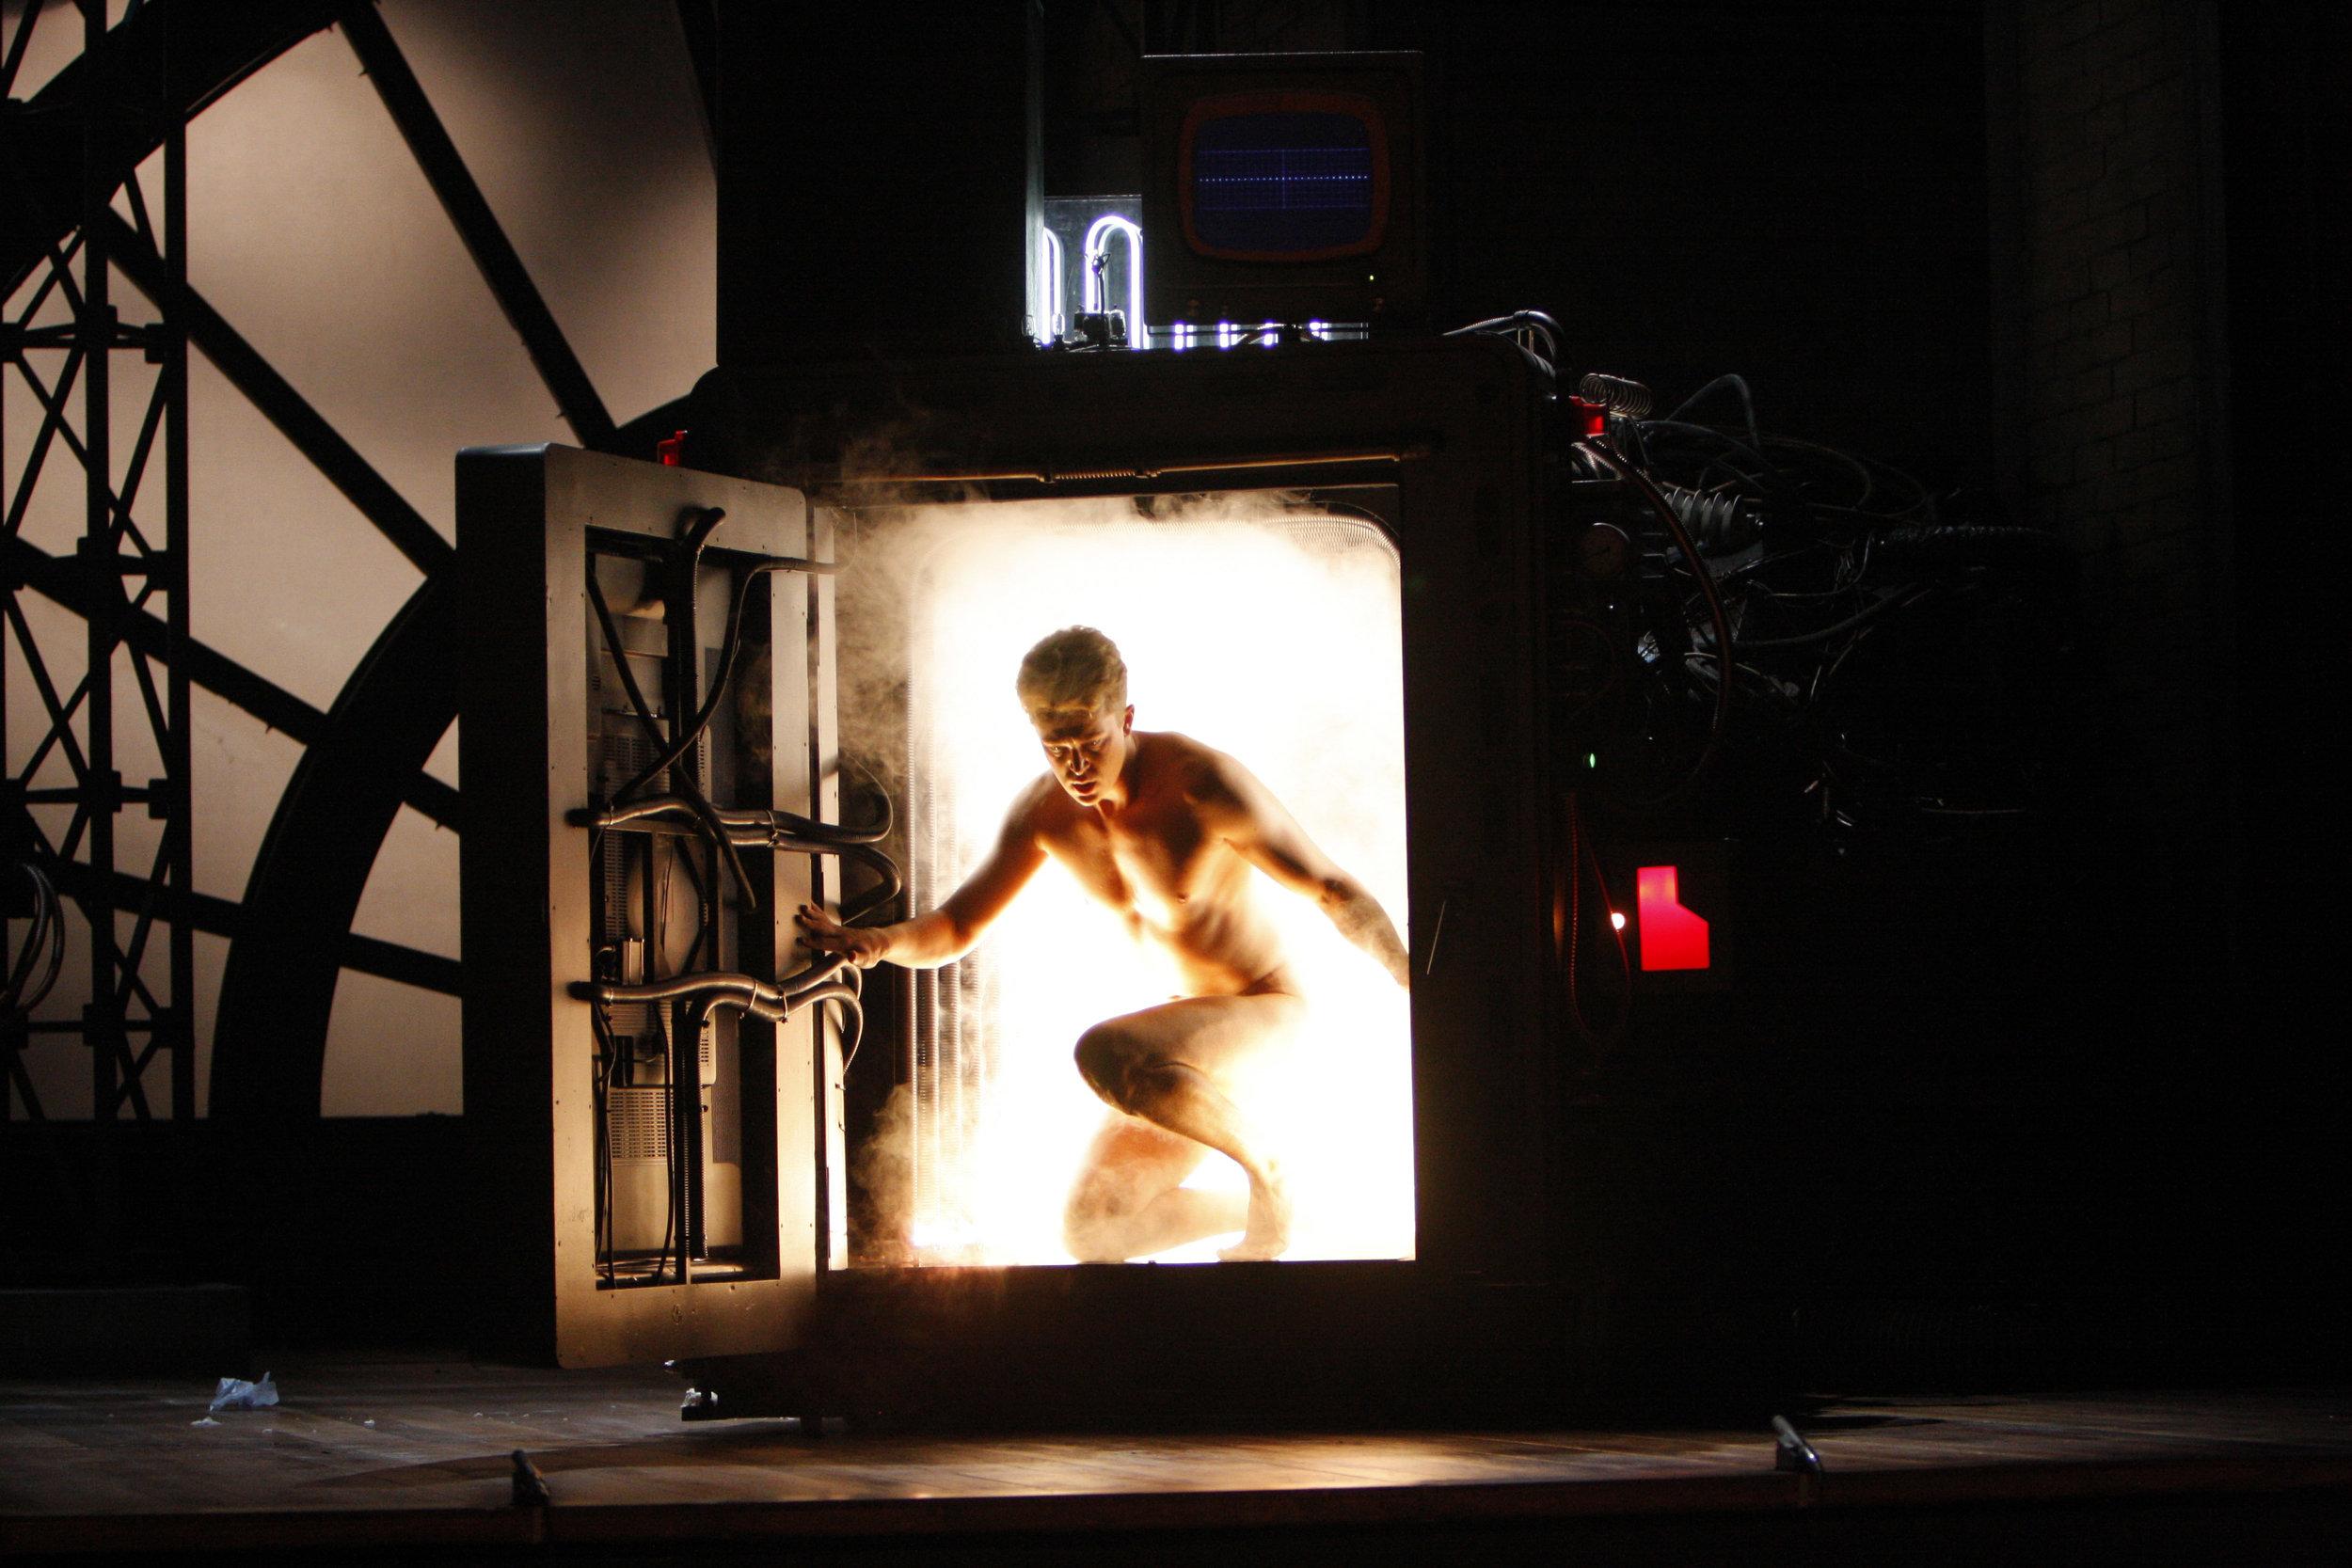 Daniel Okulitch饰演Seth Brundle。图片来源: Robert Millard, 美国洛杉矶歌剧院, 2008